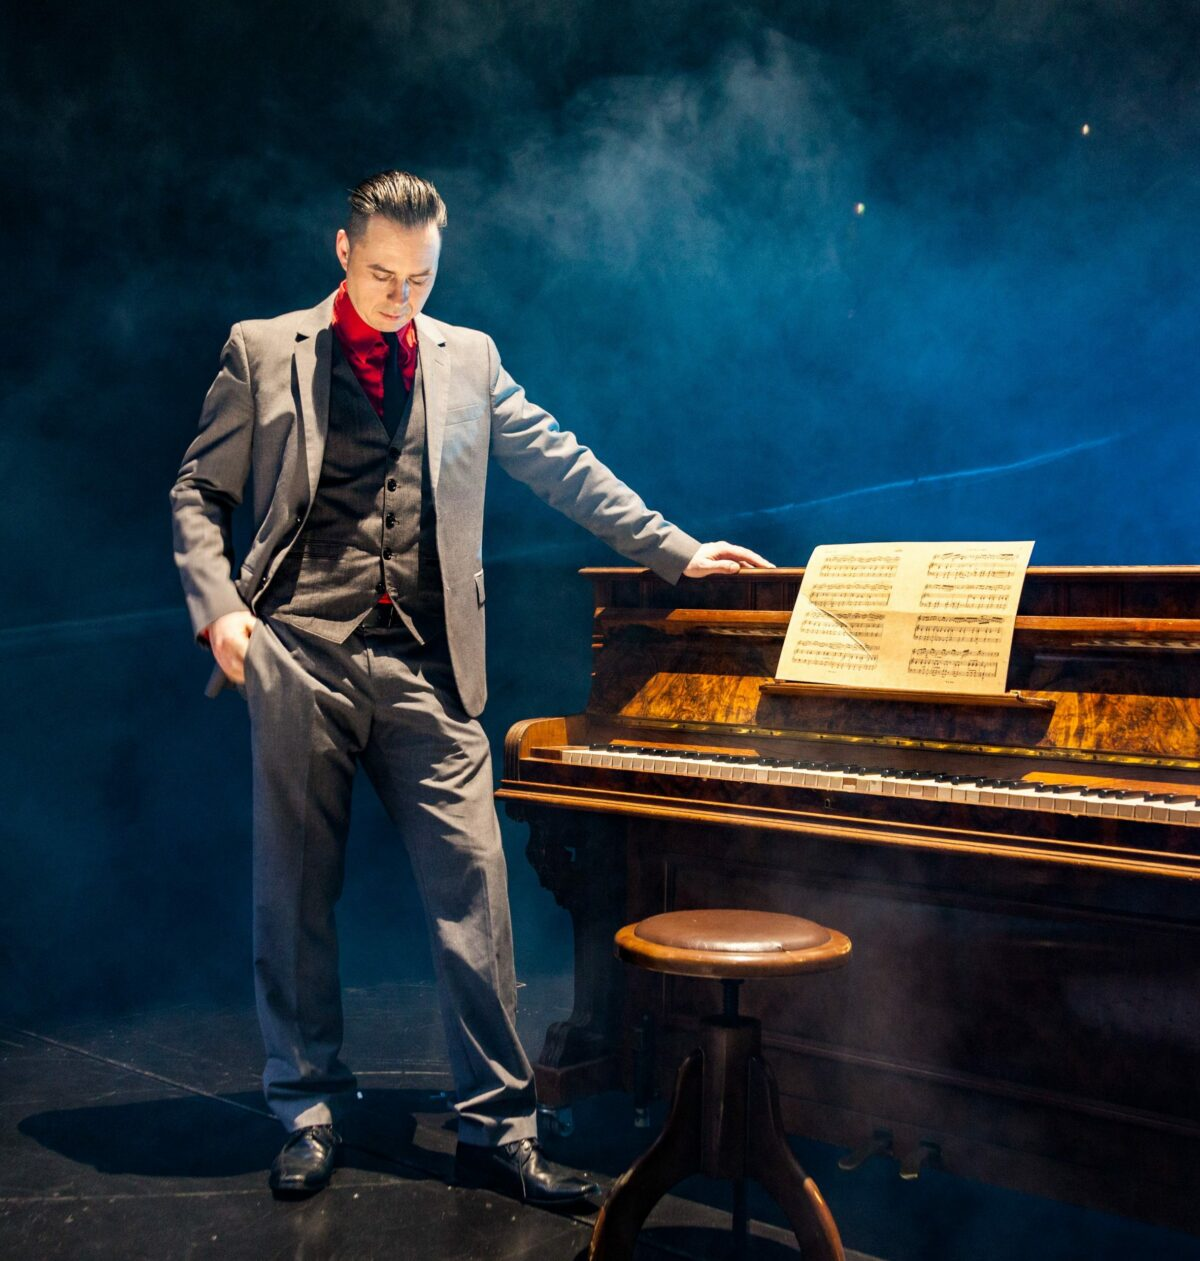 tom engel steht am klavier